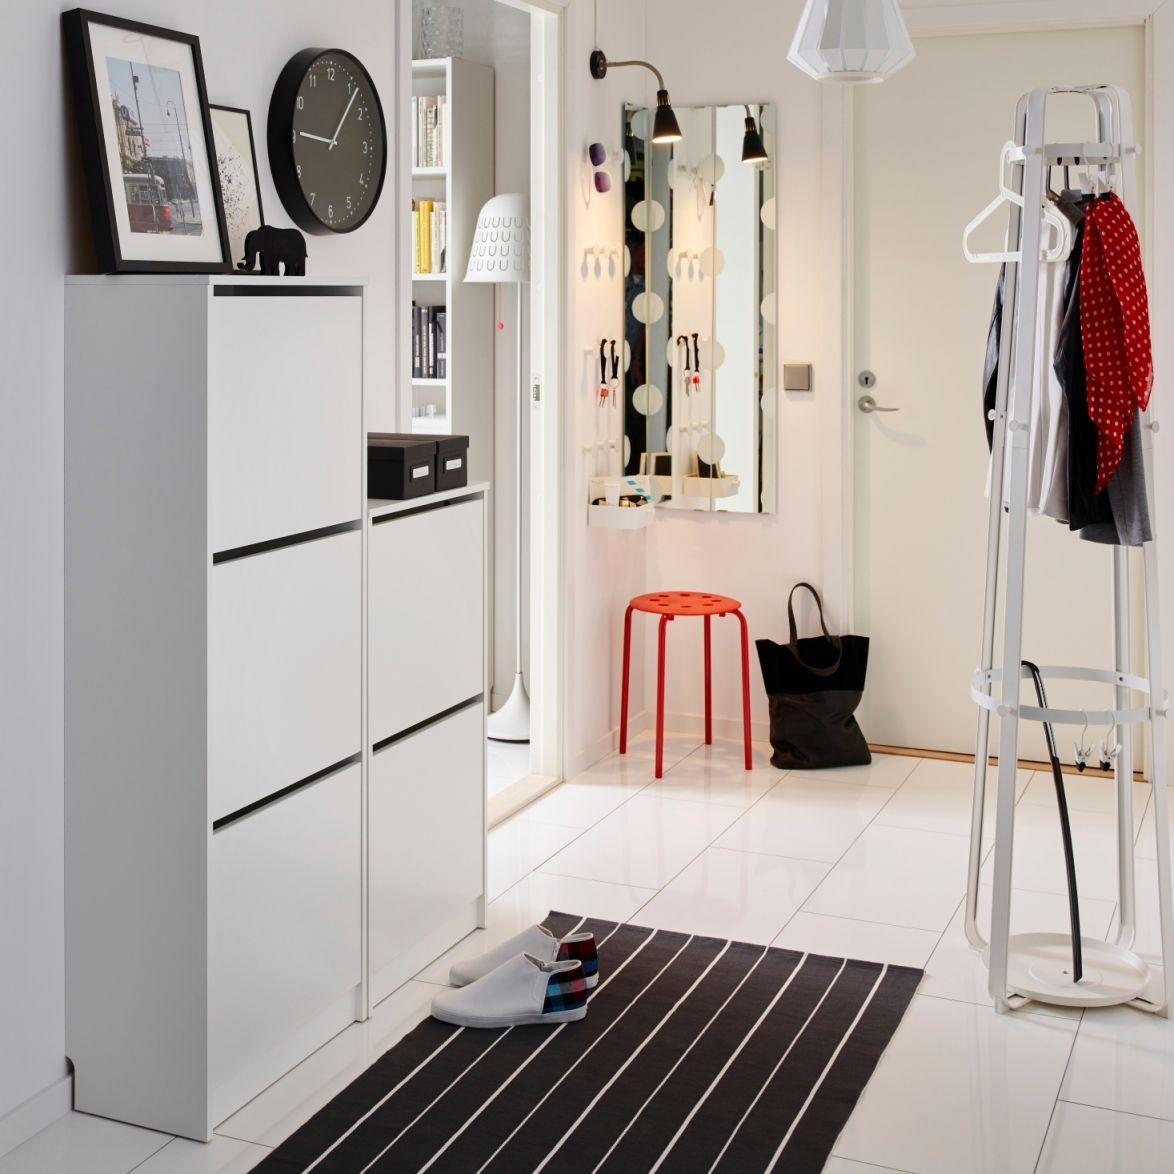 Hallway storage shoes  Ιδέες για τα έπιπλα εισόδου  IKEA Ελλάδα  Хранение  Pinterest